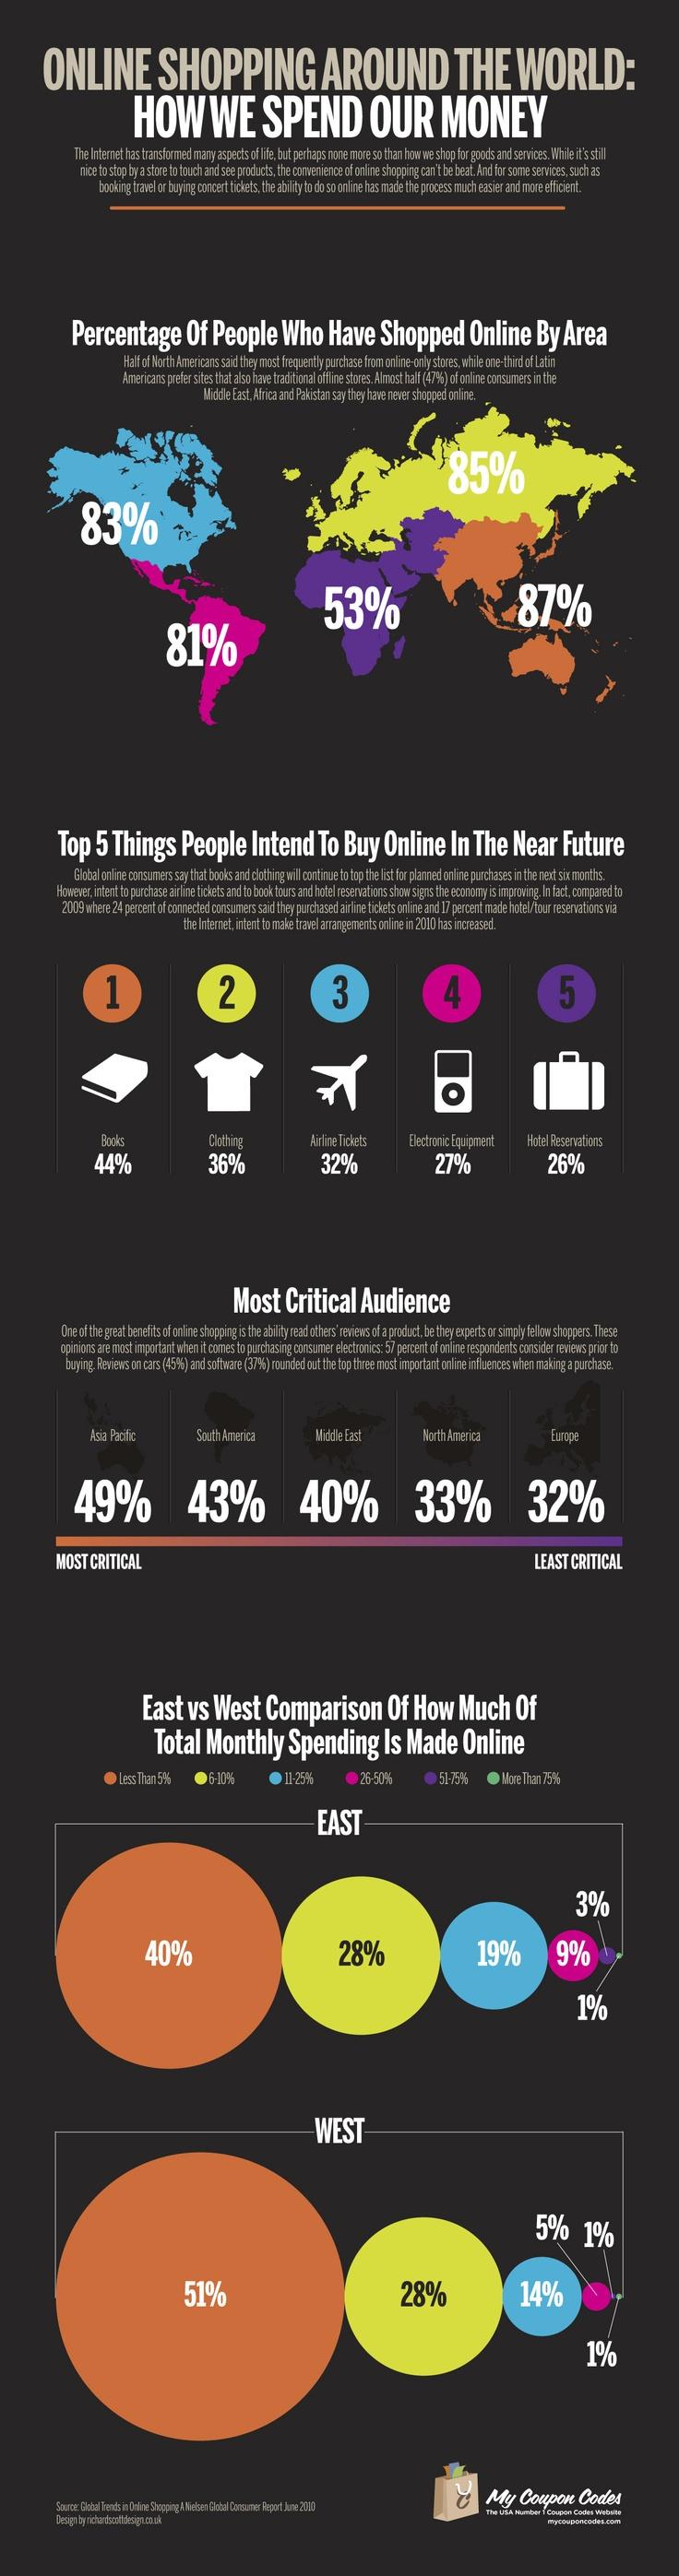 online shopping around the world